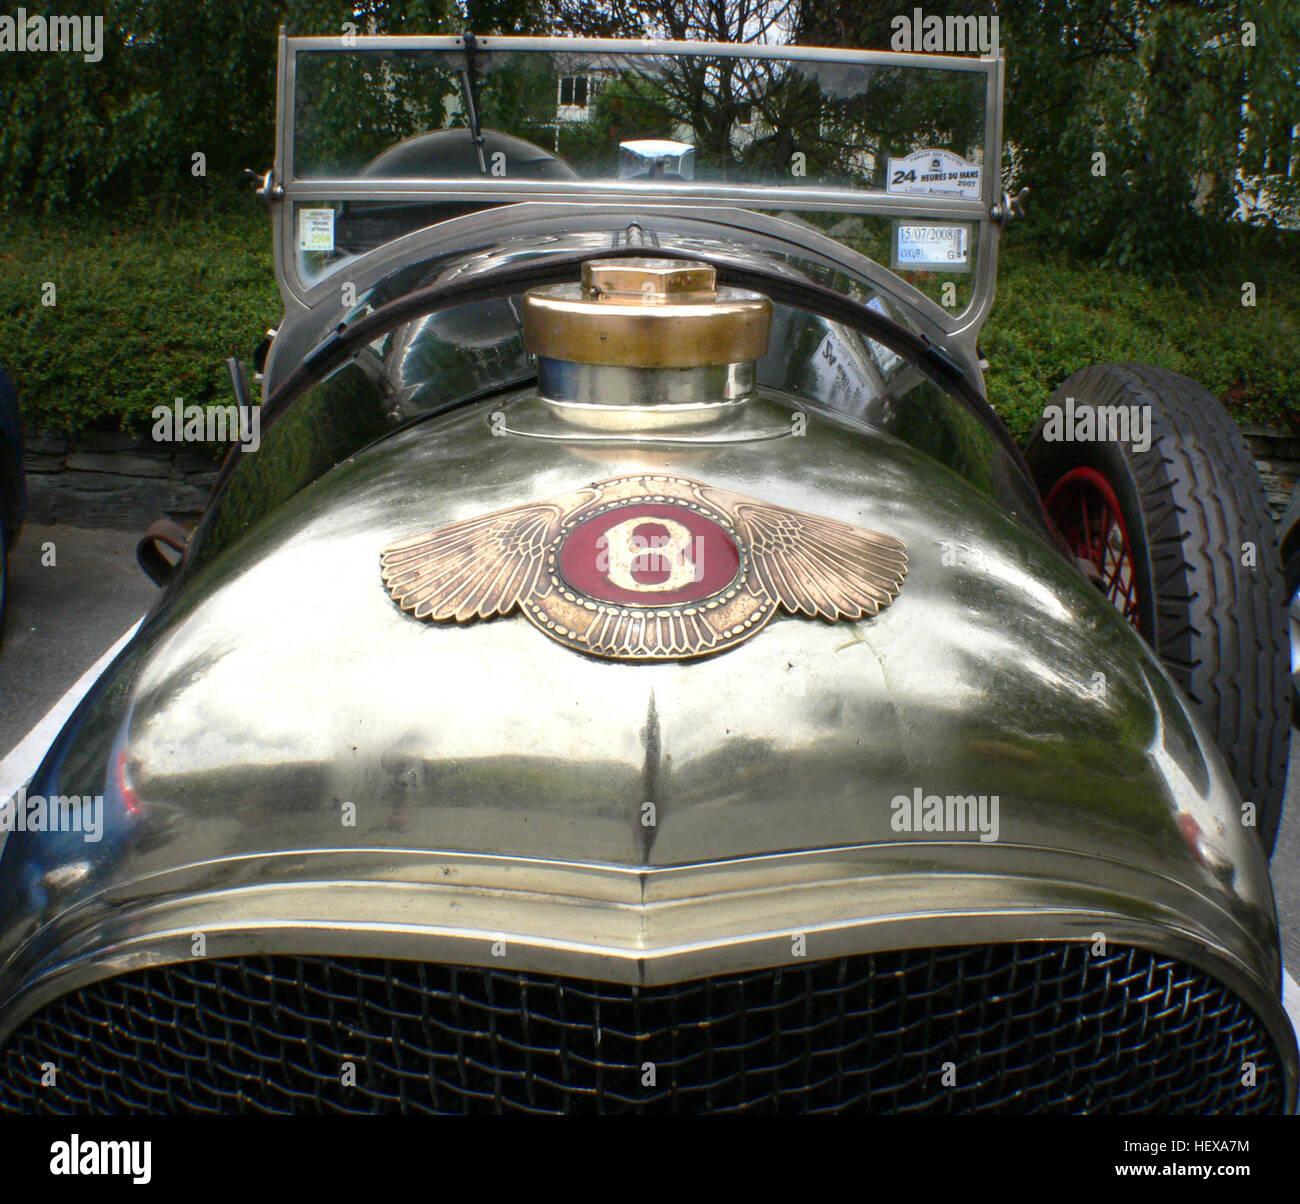 Ication Bentley TourerBridge CameraBritish Classic - Sports cars international